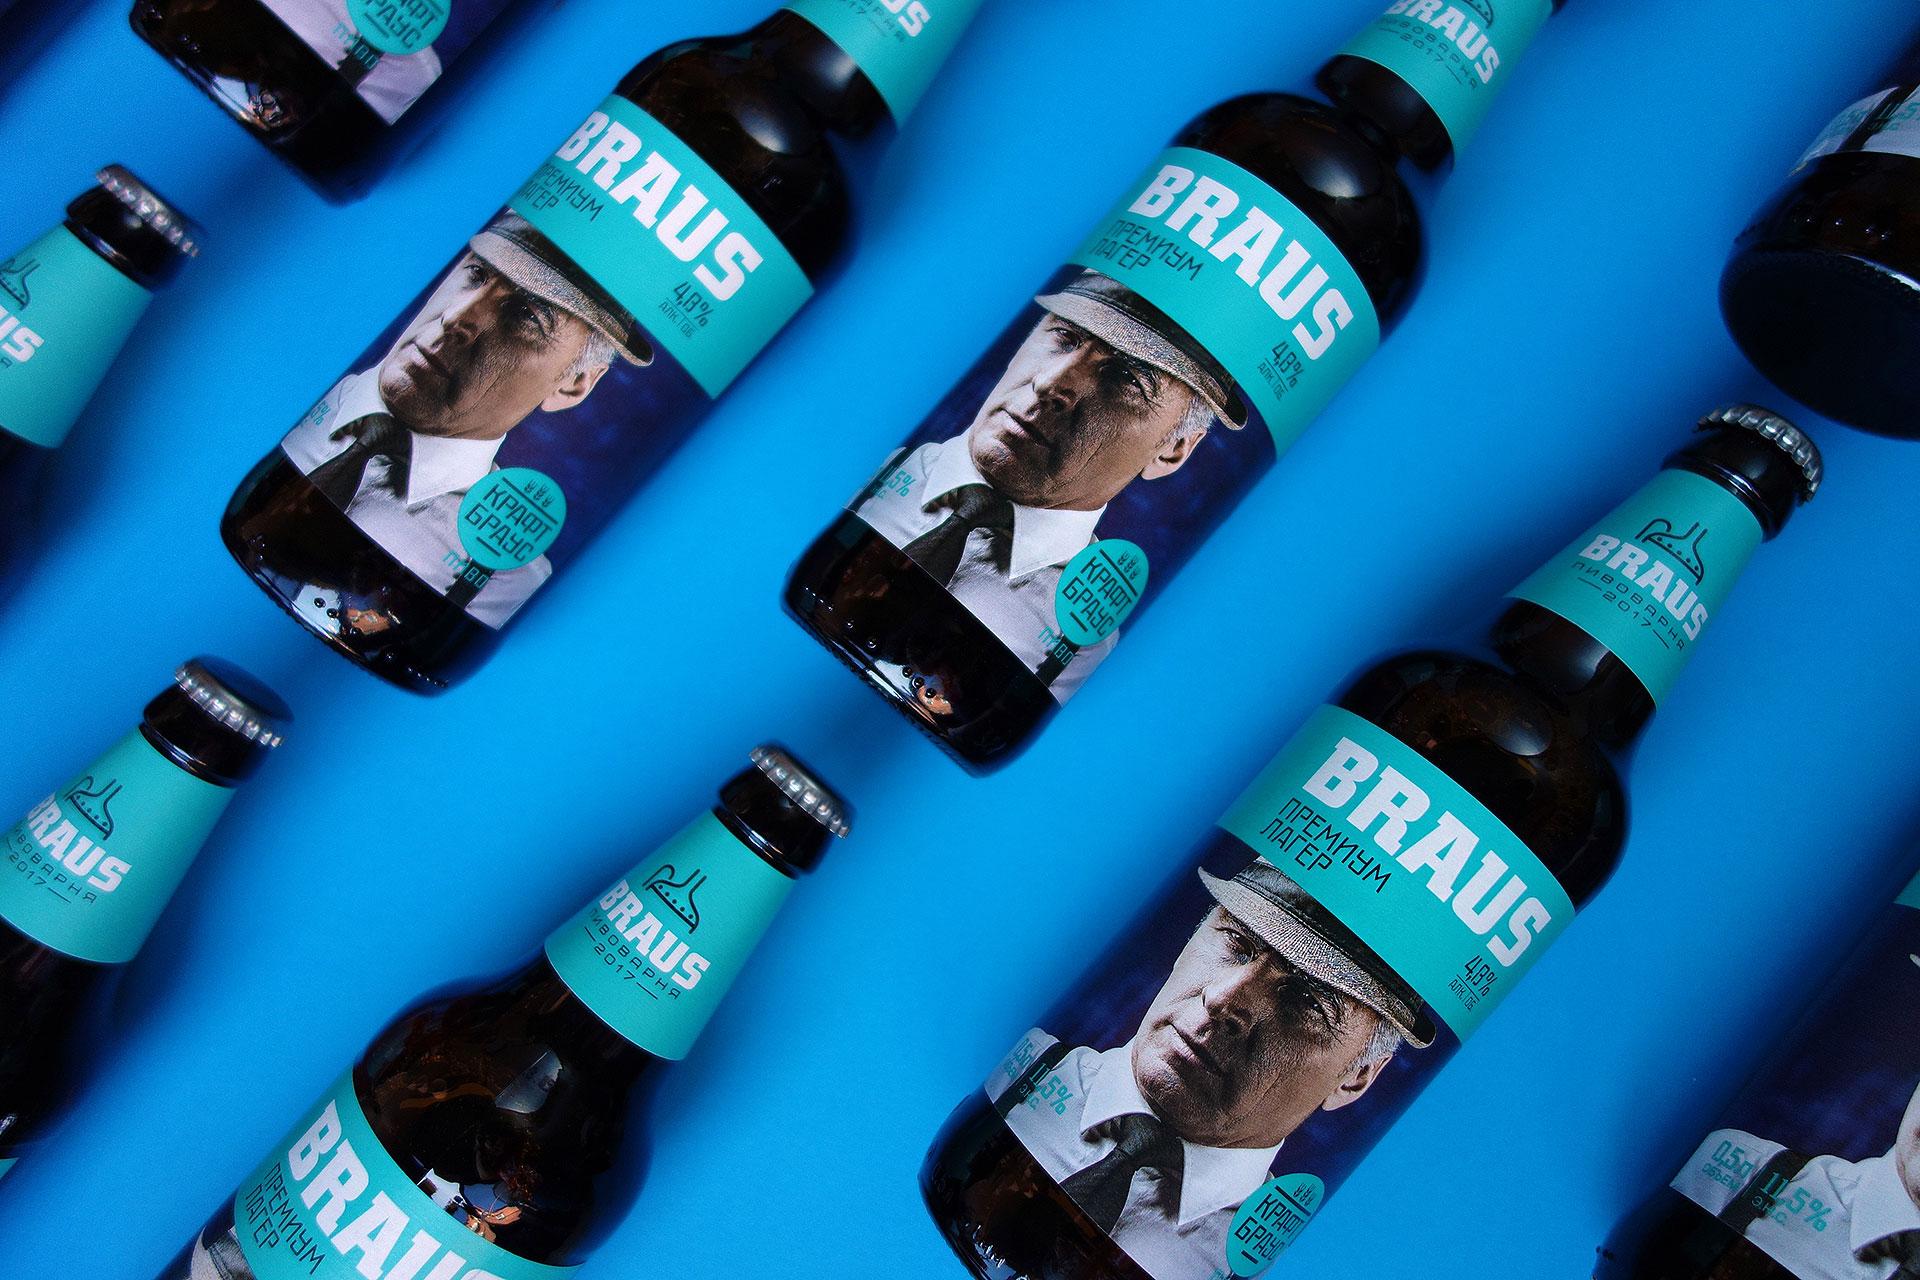 Агентство Асгард, branding, drink design, упаковка, Braus beer, пиво Браус, Премиум Лагер